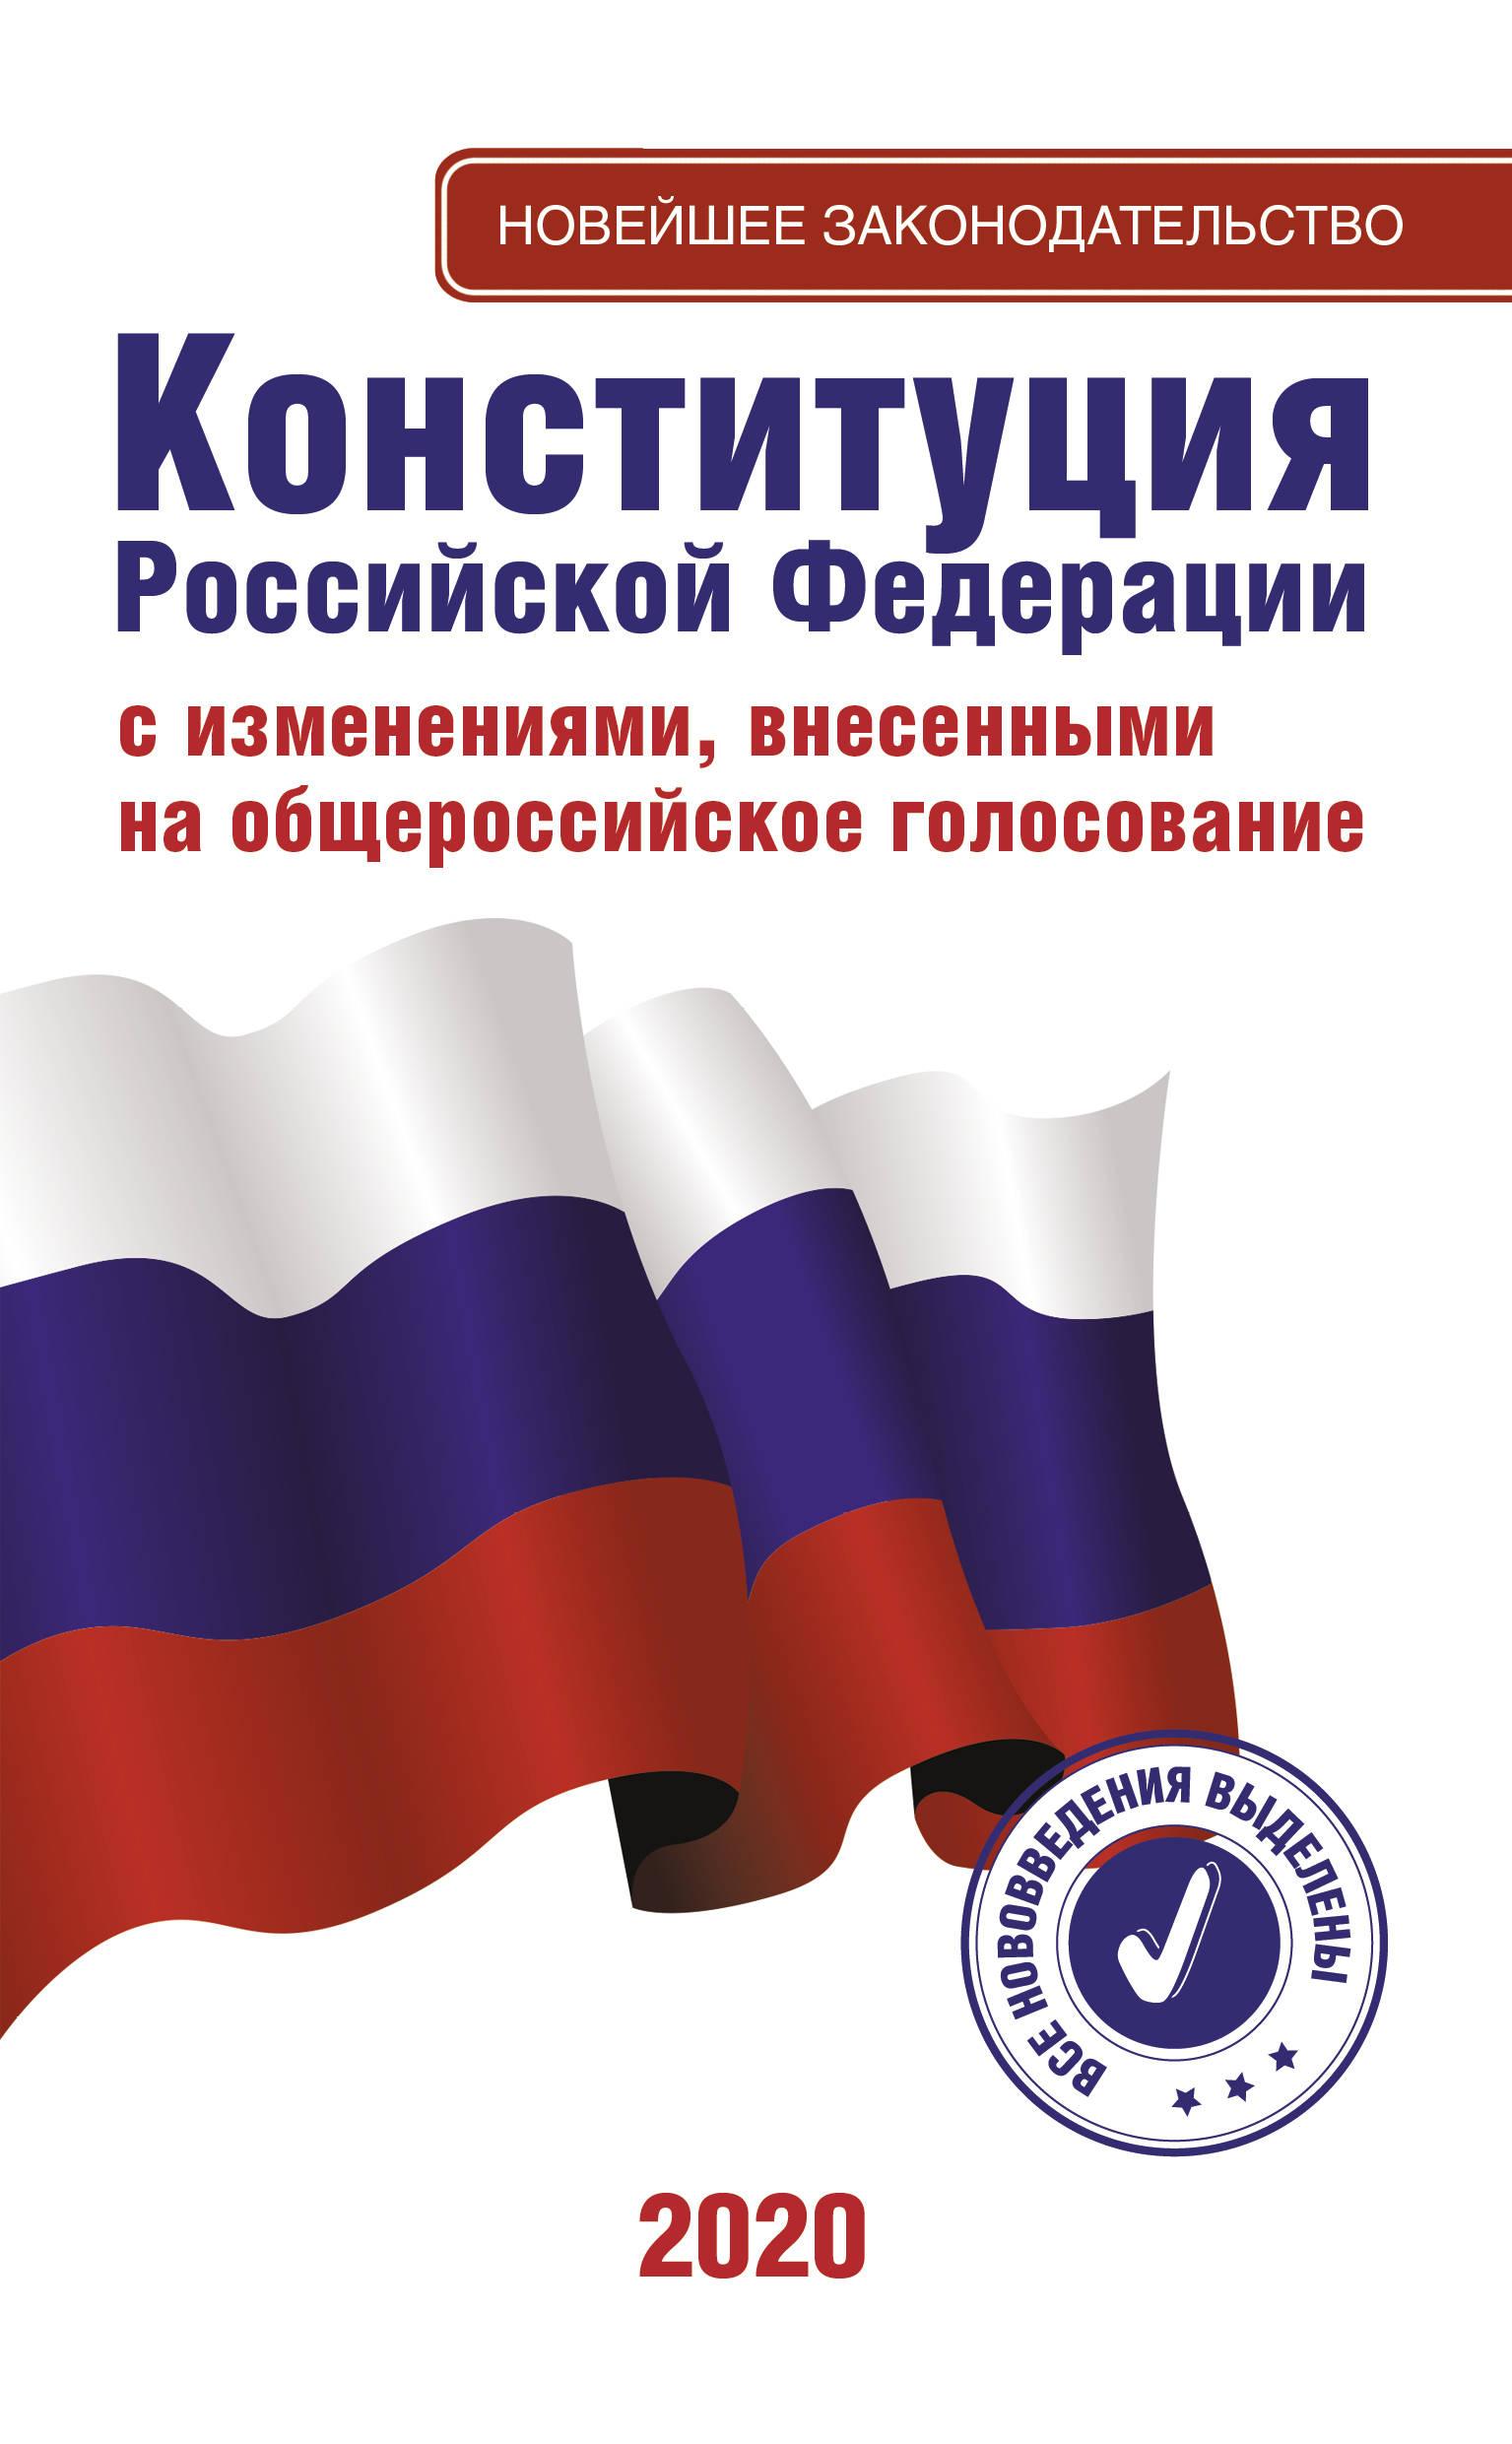 Konstitutsija Rossijskoj Federatsii s izmenenijami , vnesennymi na obscherossijskoe golosovanie 2020